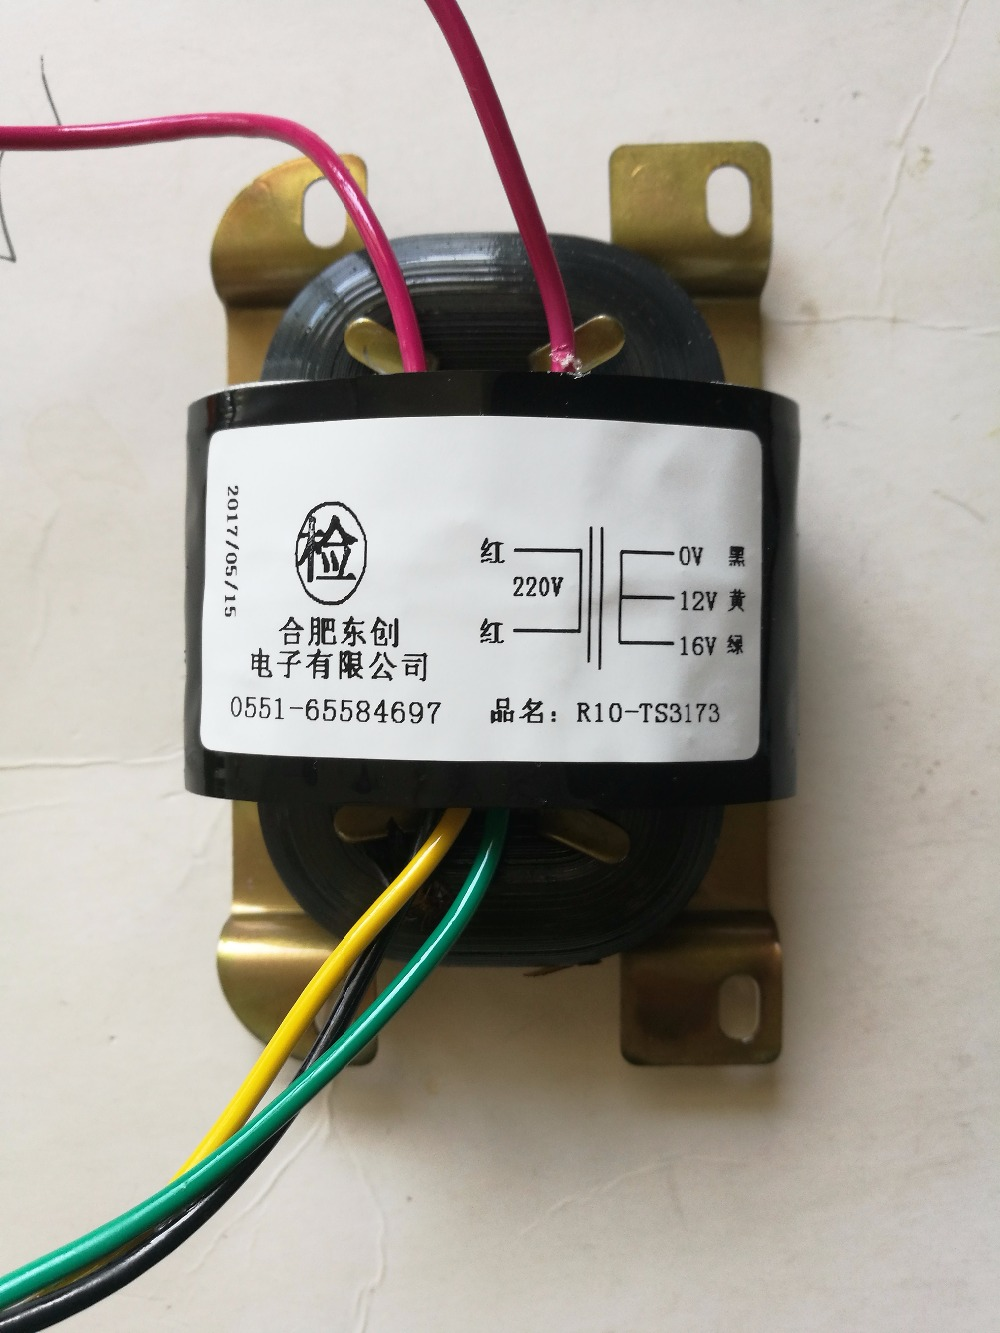 0-12v-16v Transformator R Core R20 Benutzerdefinierte Transformator 220 V 25va Kupfer Schild Verkehrs Licht Speziellen Transformator Quell Sommer Durst